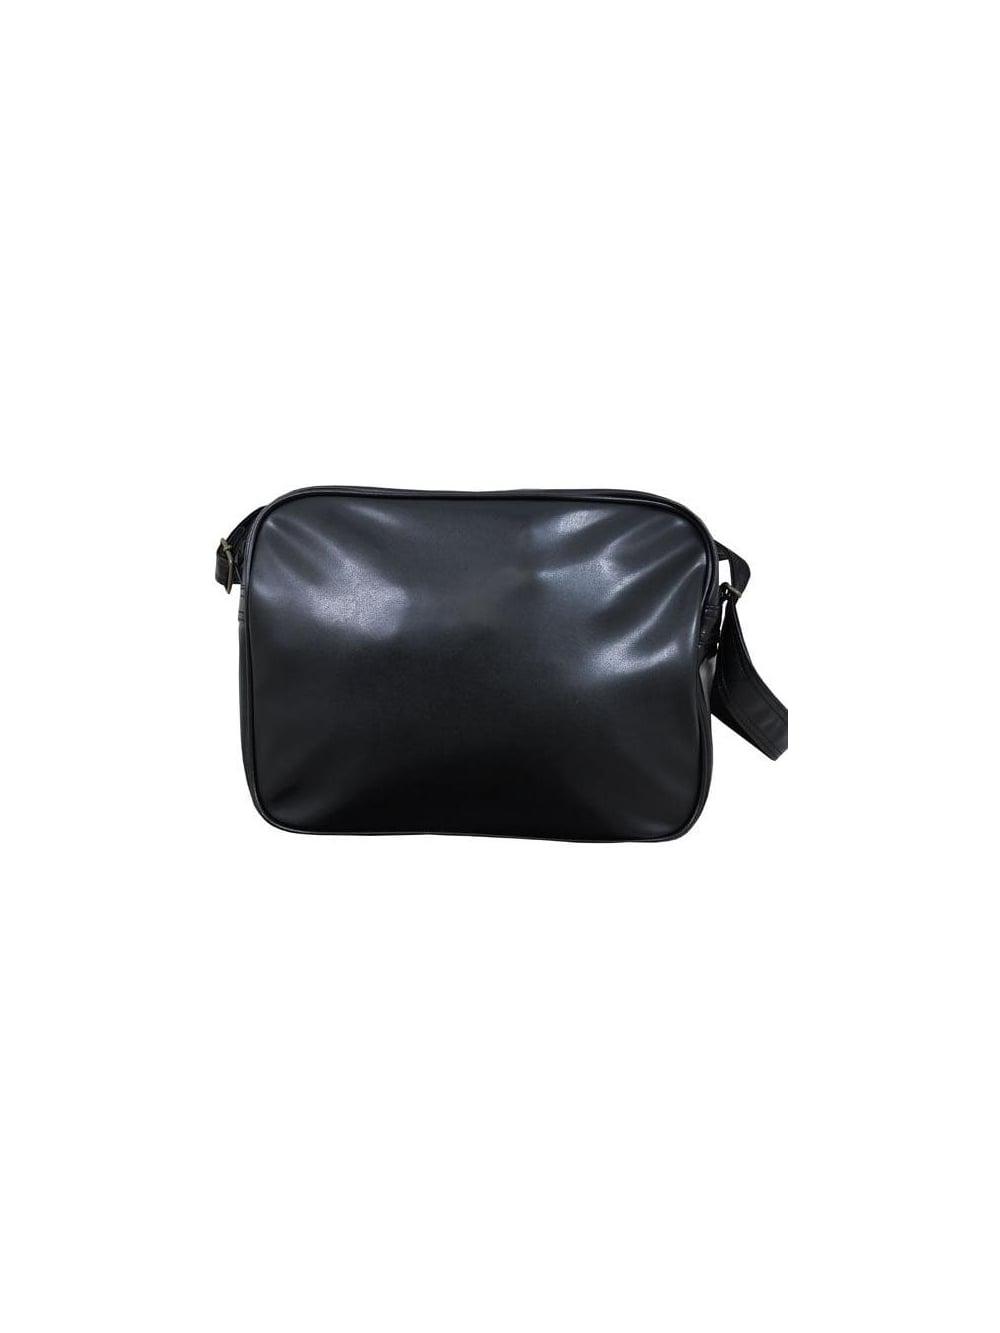 Adidas Originals AC Airline Bag in Black - Northern Threads 1f3701d63ca80